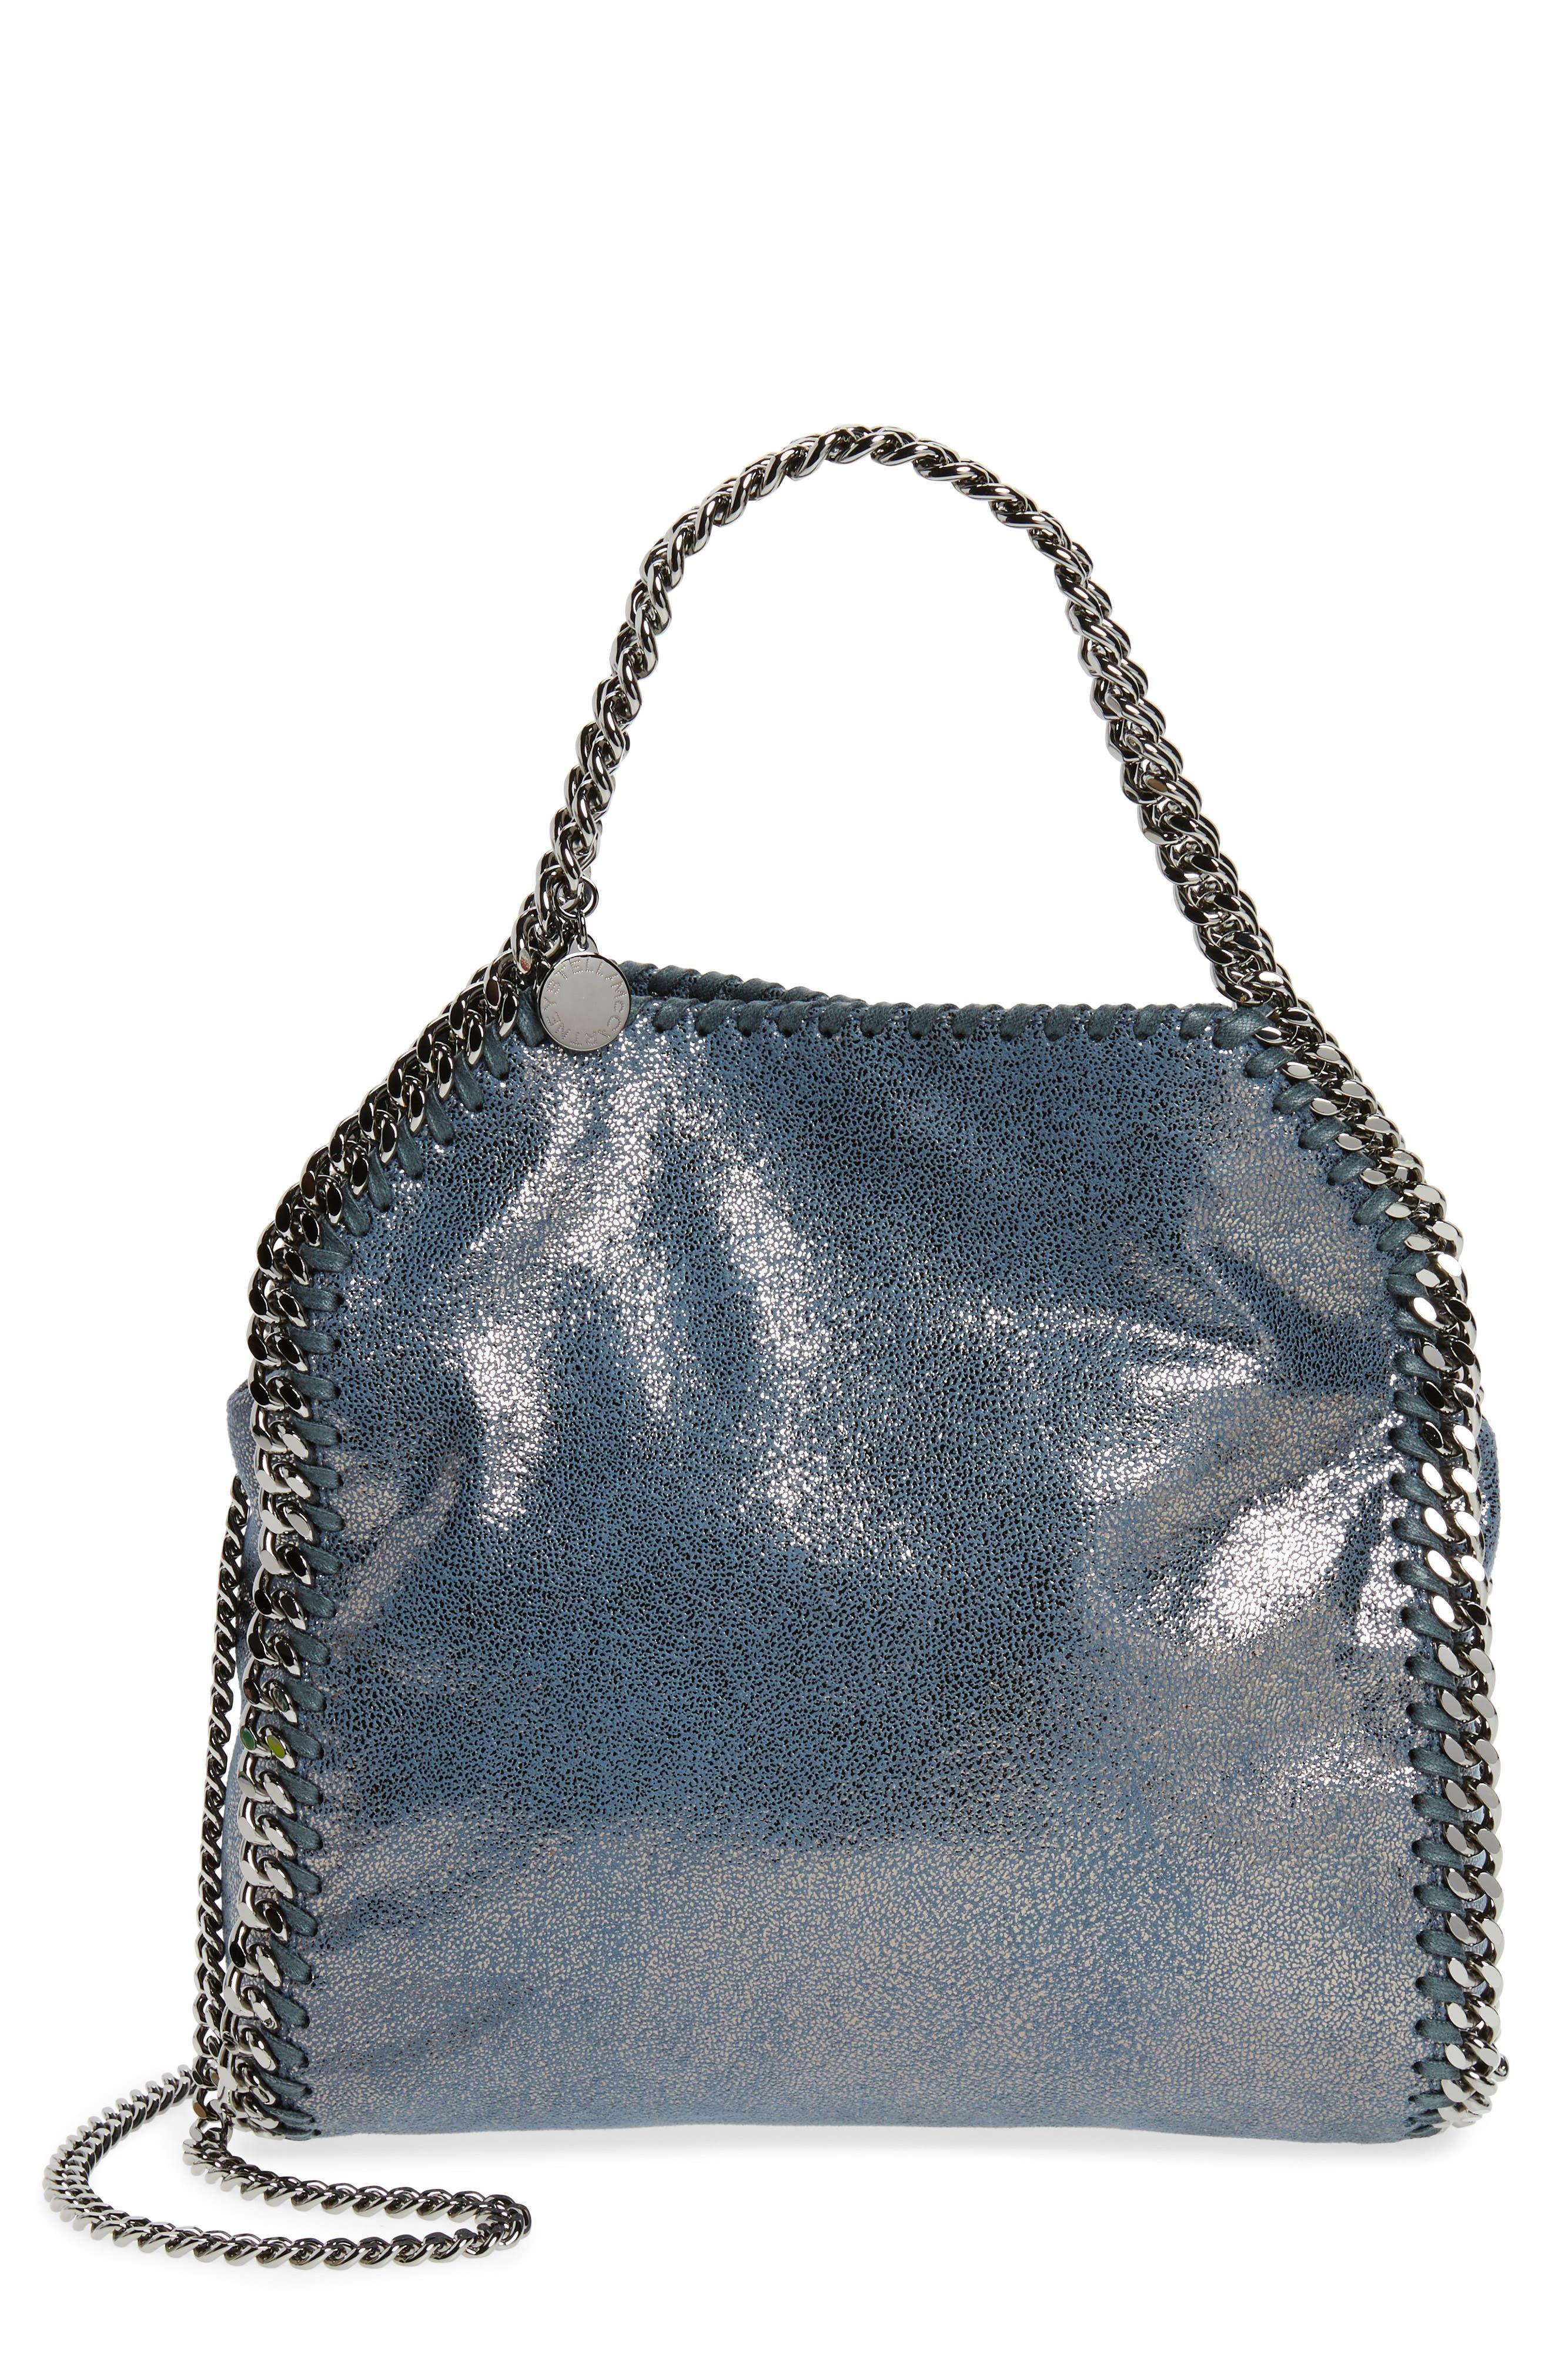 Alternate Image 1 Selected - Stella McCartney Mini Falabella Shaggy Deer Metallic Faux Leather Tote